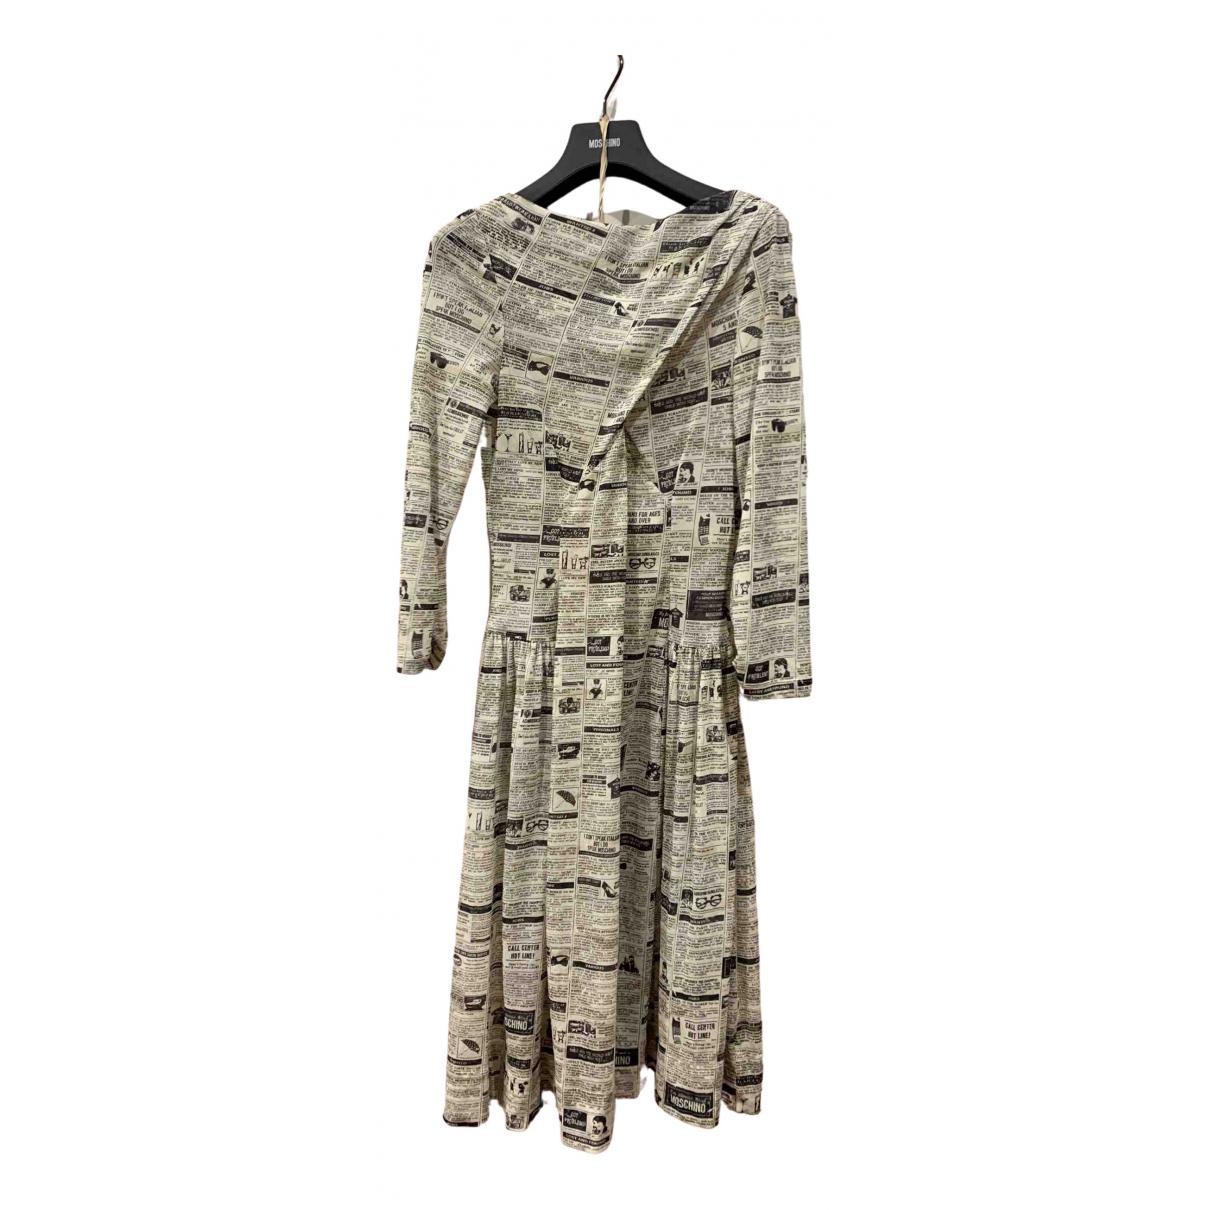 Moschino \N White dress for Women 44 IT